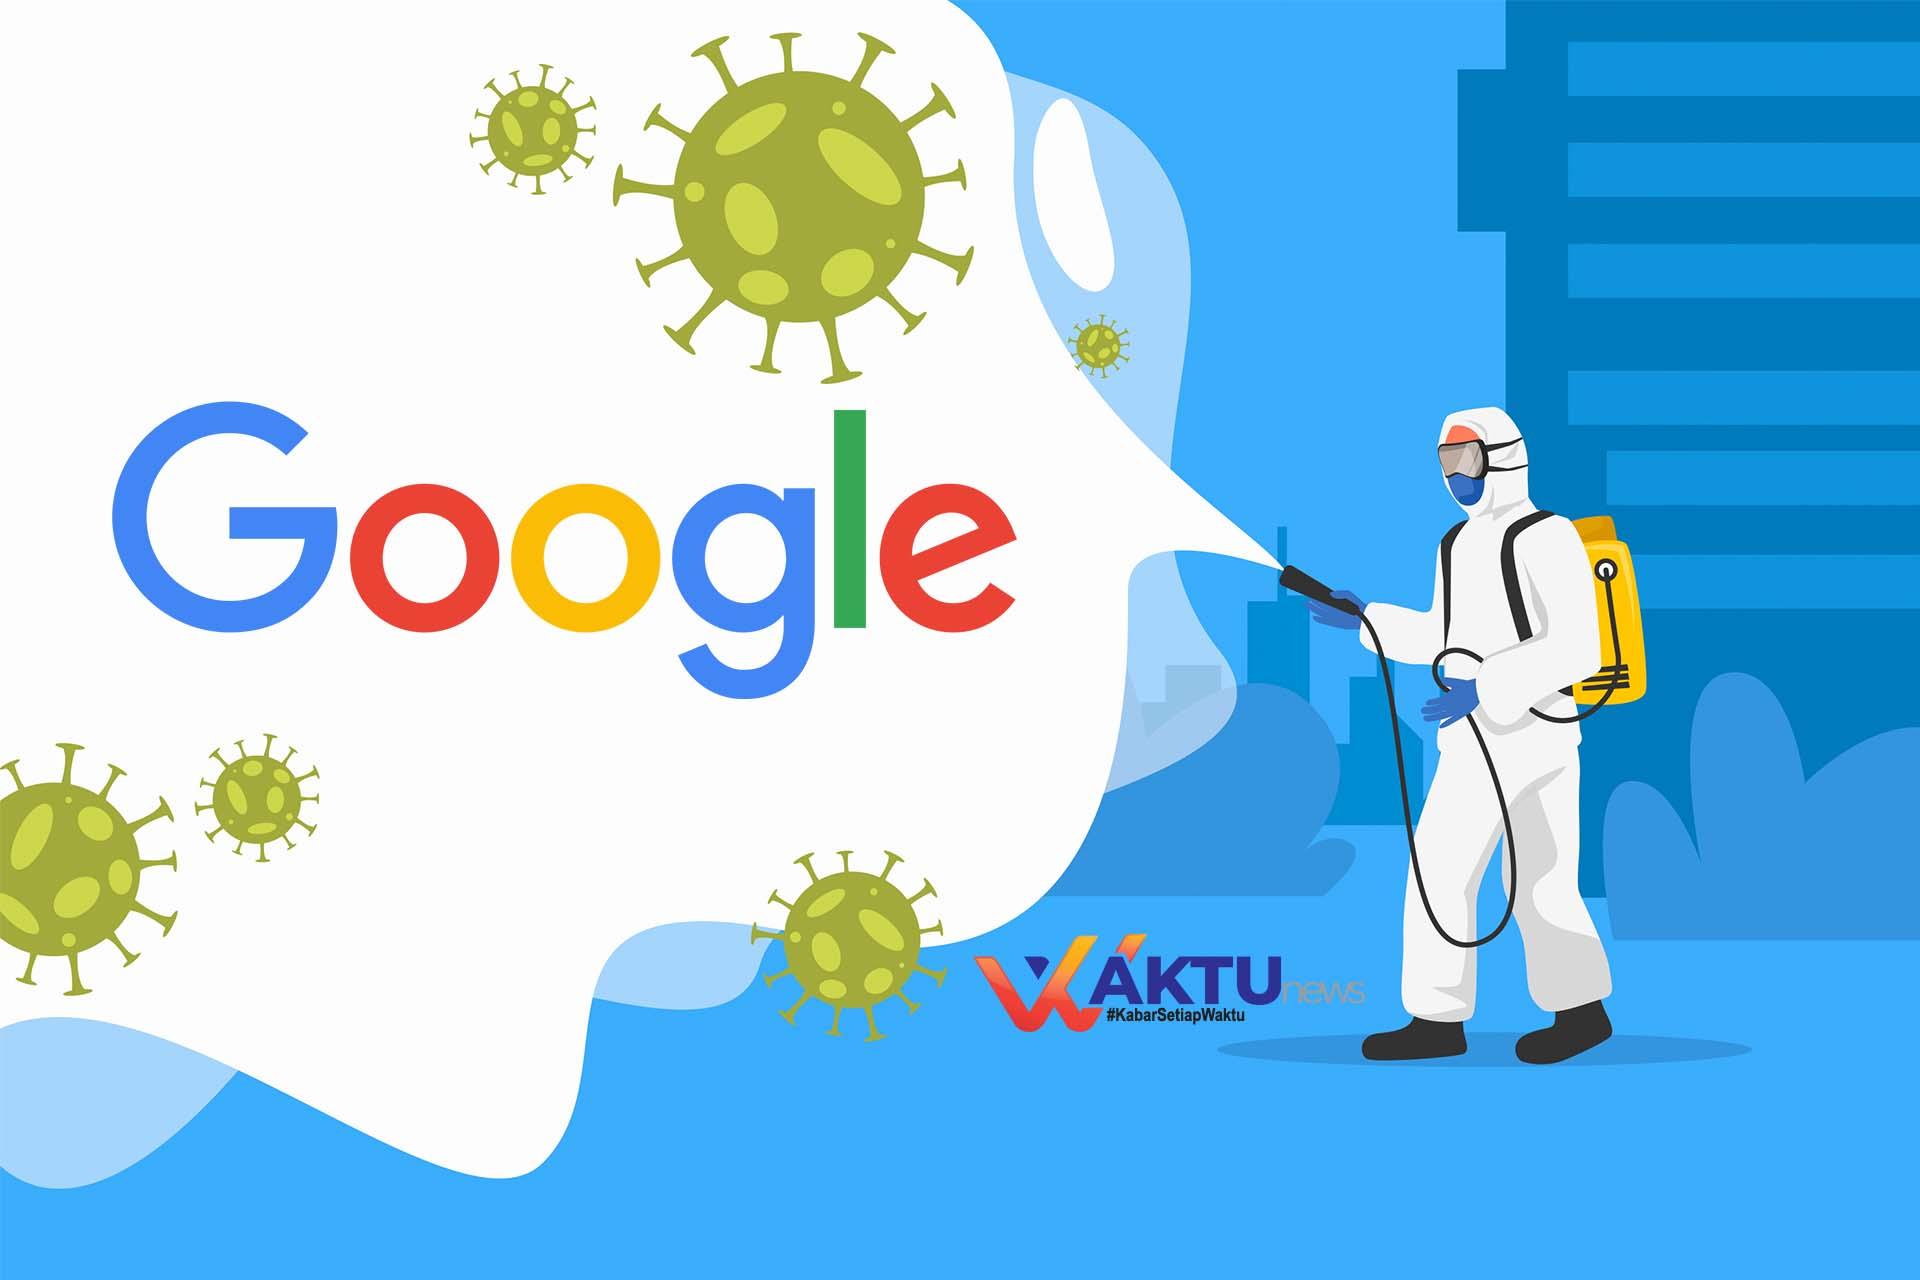 Google Lakukan Tes COVID-19